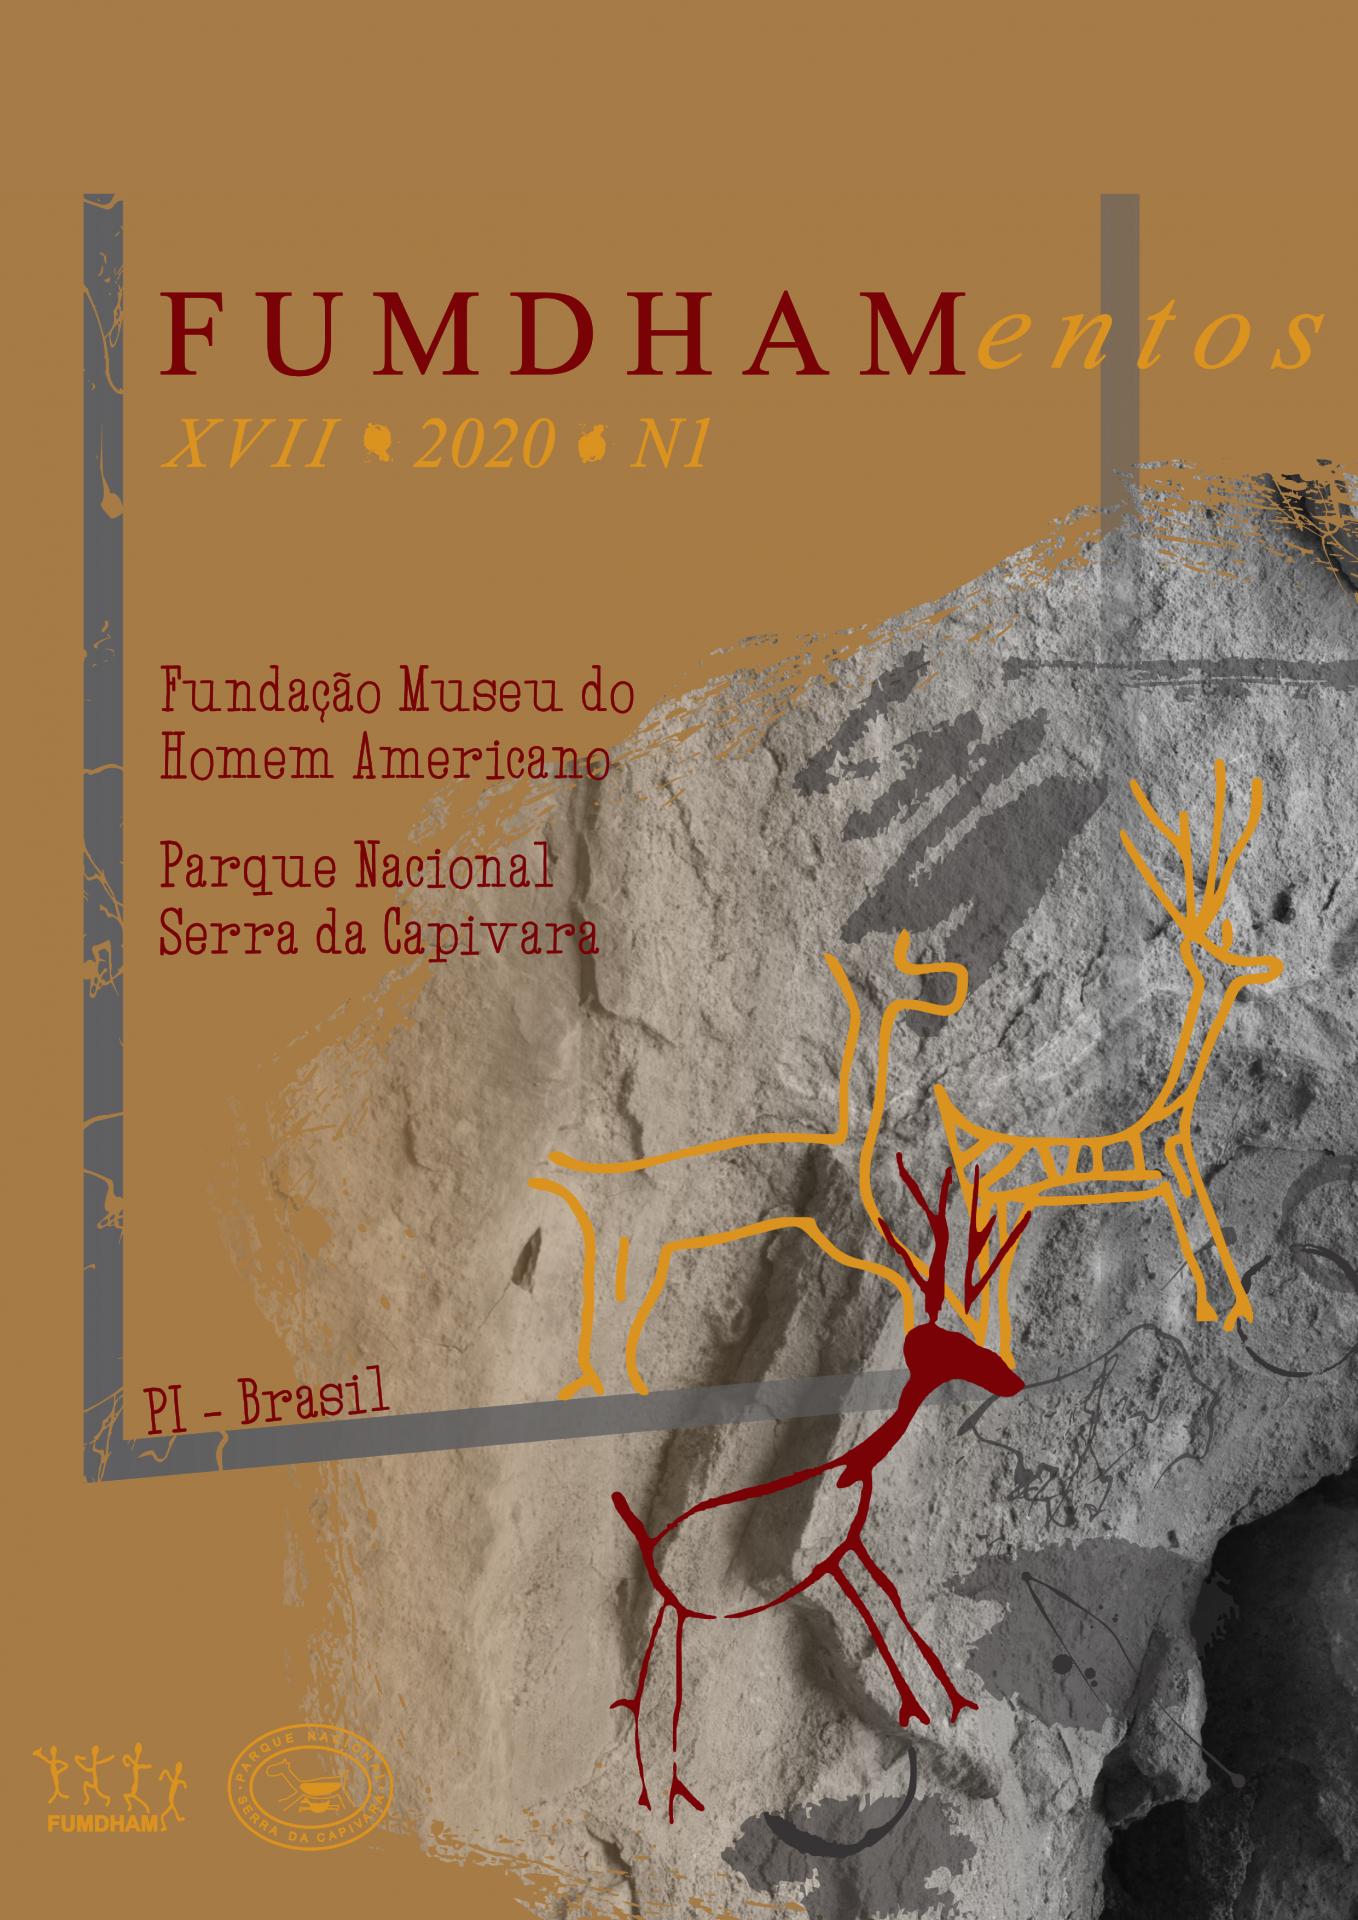 FUMDHAMENTOS XVII – 2020 – N.1